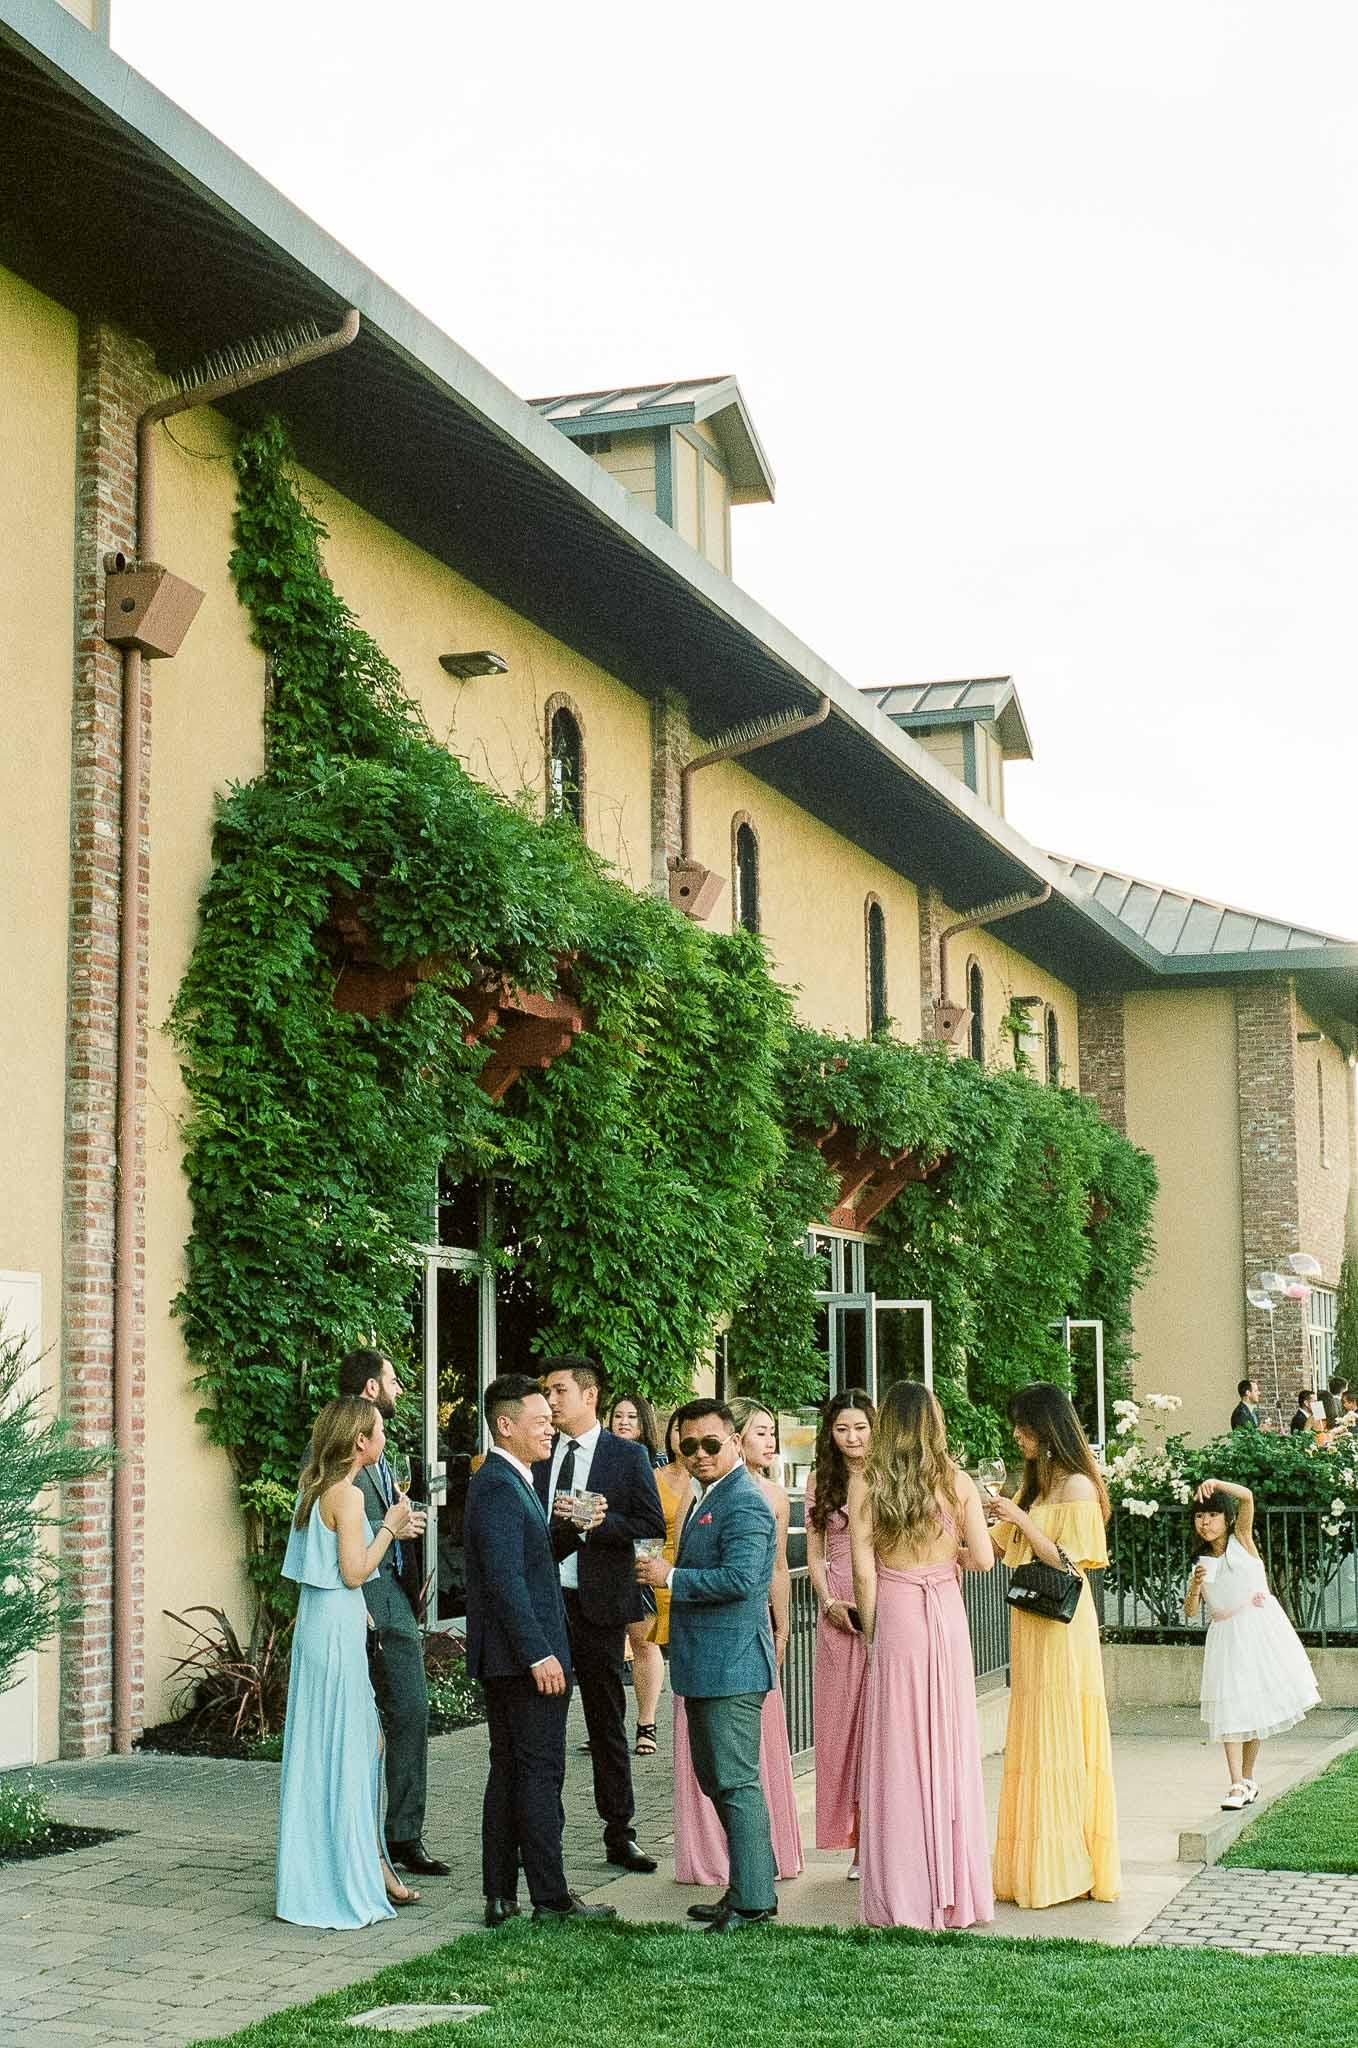 Wedding-Guests-Outdoors.jpg